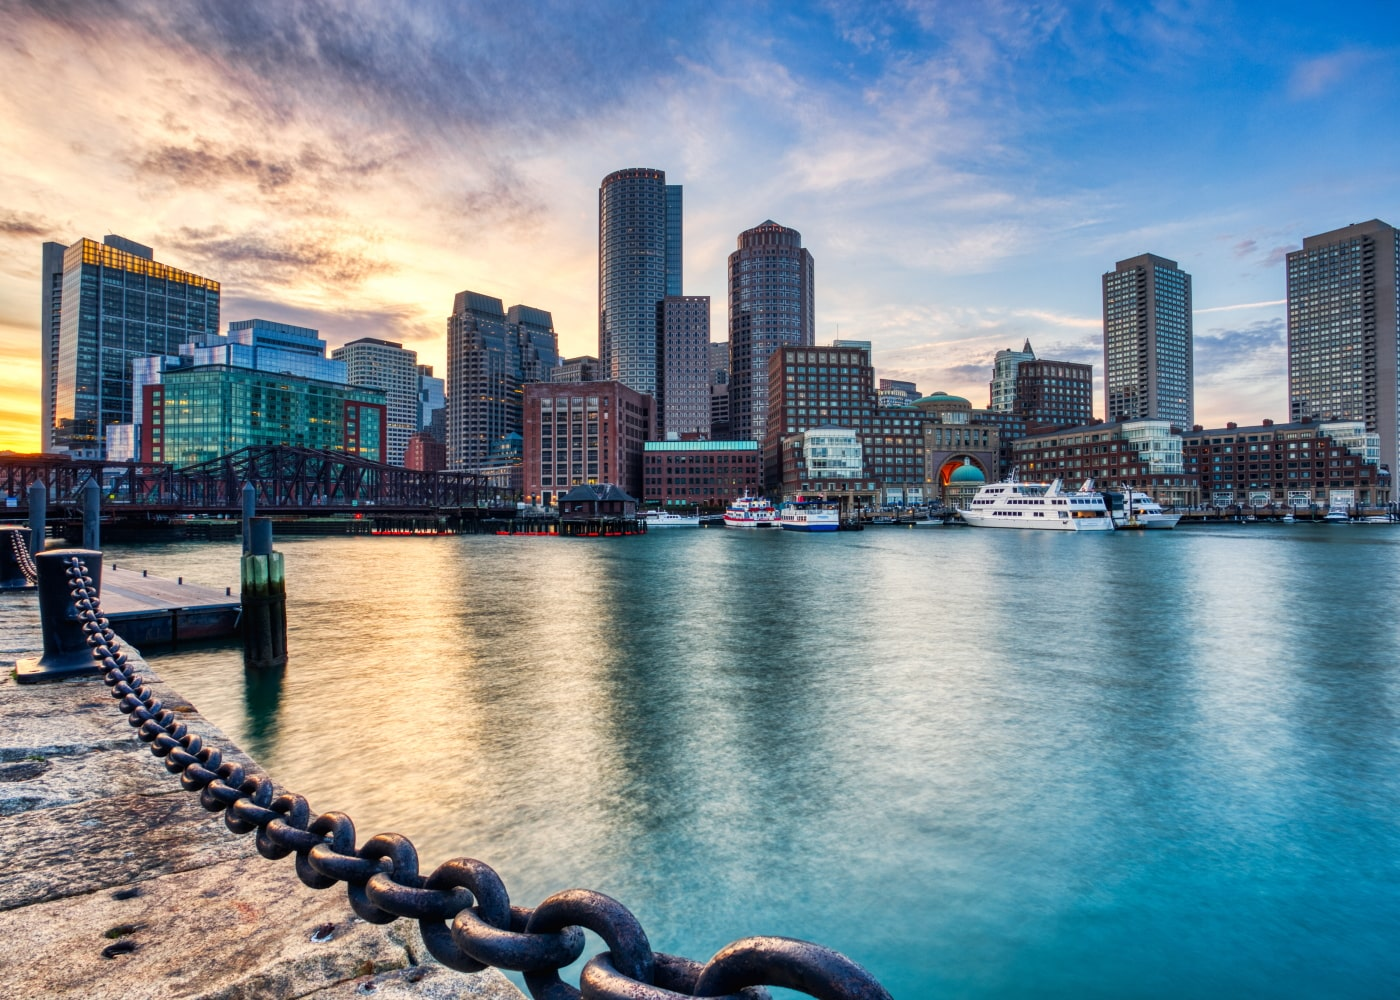 naem-conference-presentation-banner-2008-corporate-climate-strategies-ghg-management-boston-massachusetts-1400x1000-min